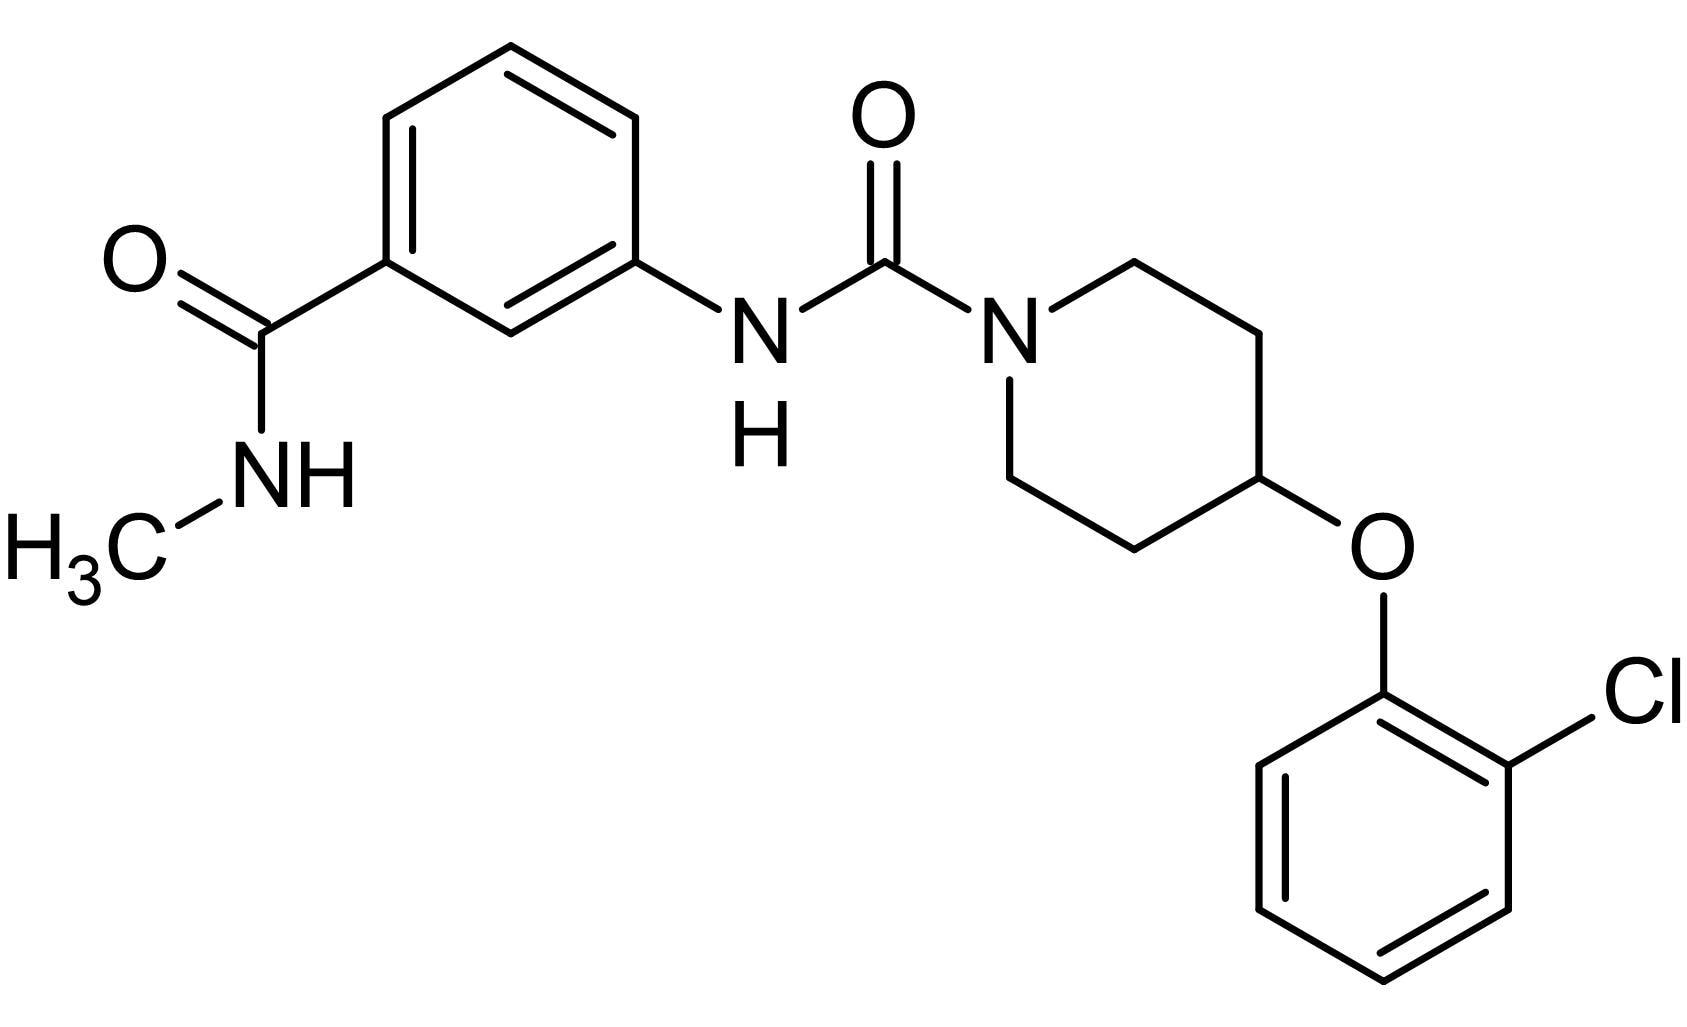 Chemical Structure - SCD1 Inhibitor (DMSO solution), SCD1(stearoyl-CoA desaturase 1) inhibitor (ab146620)